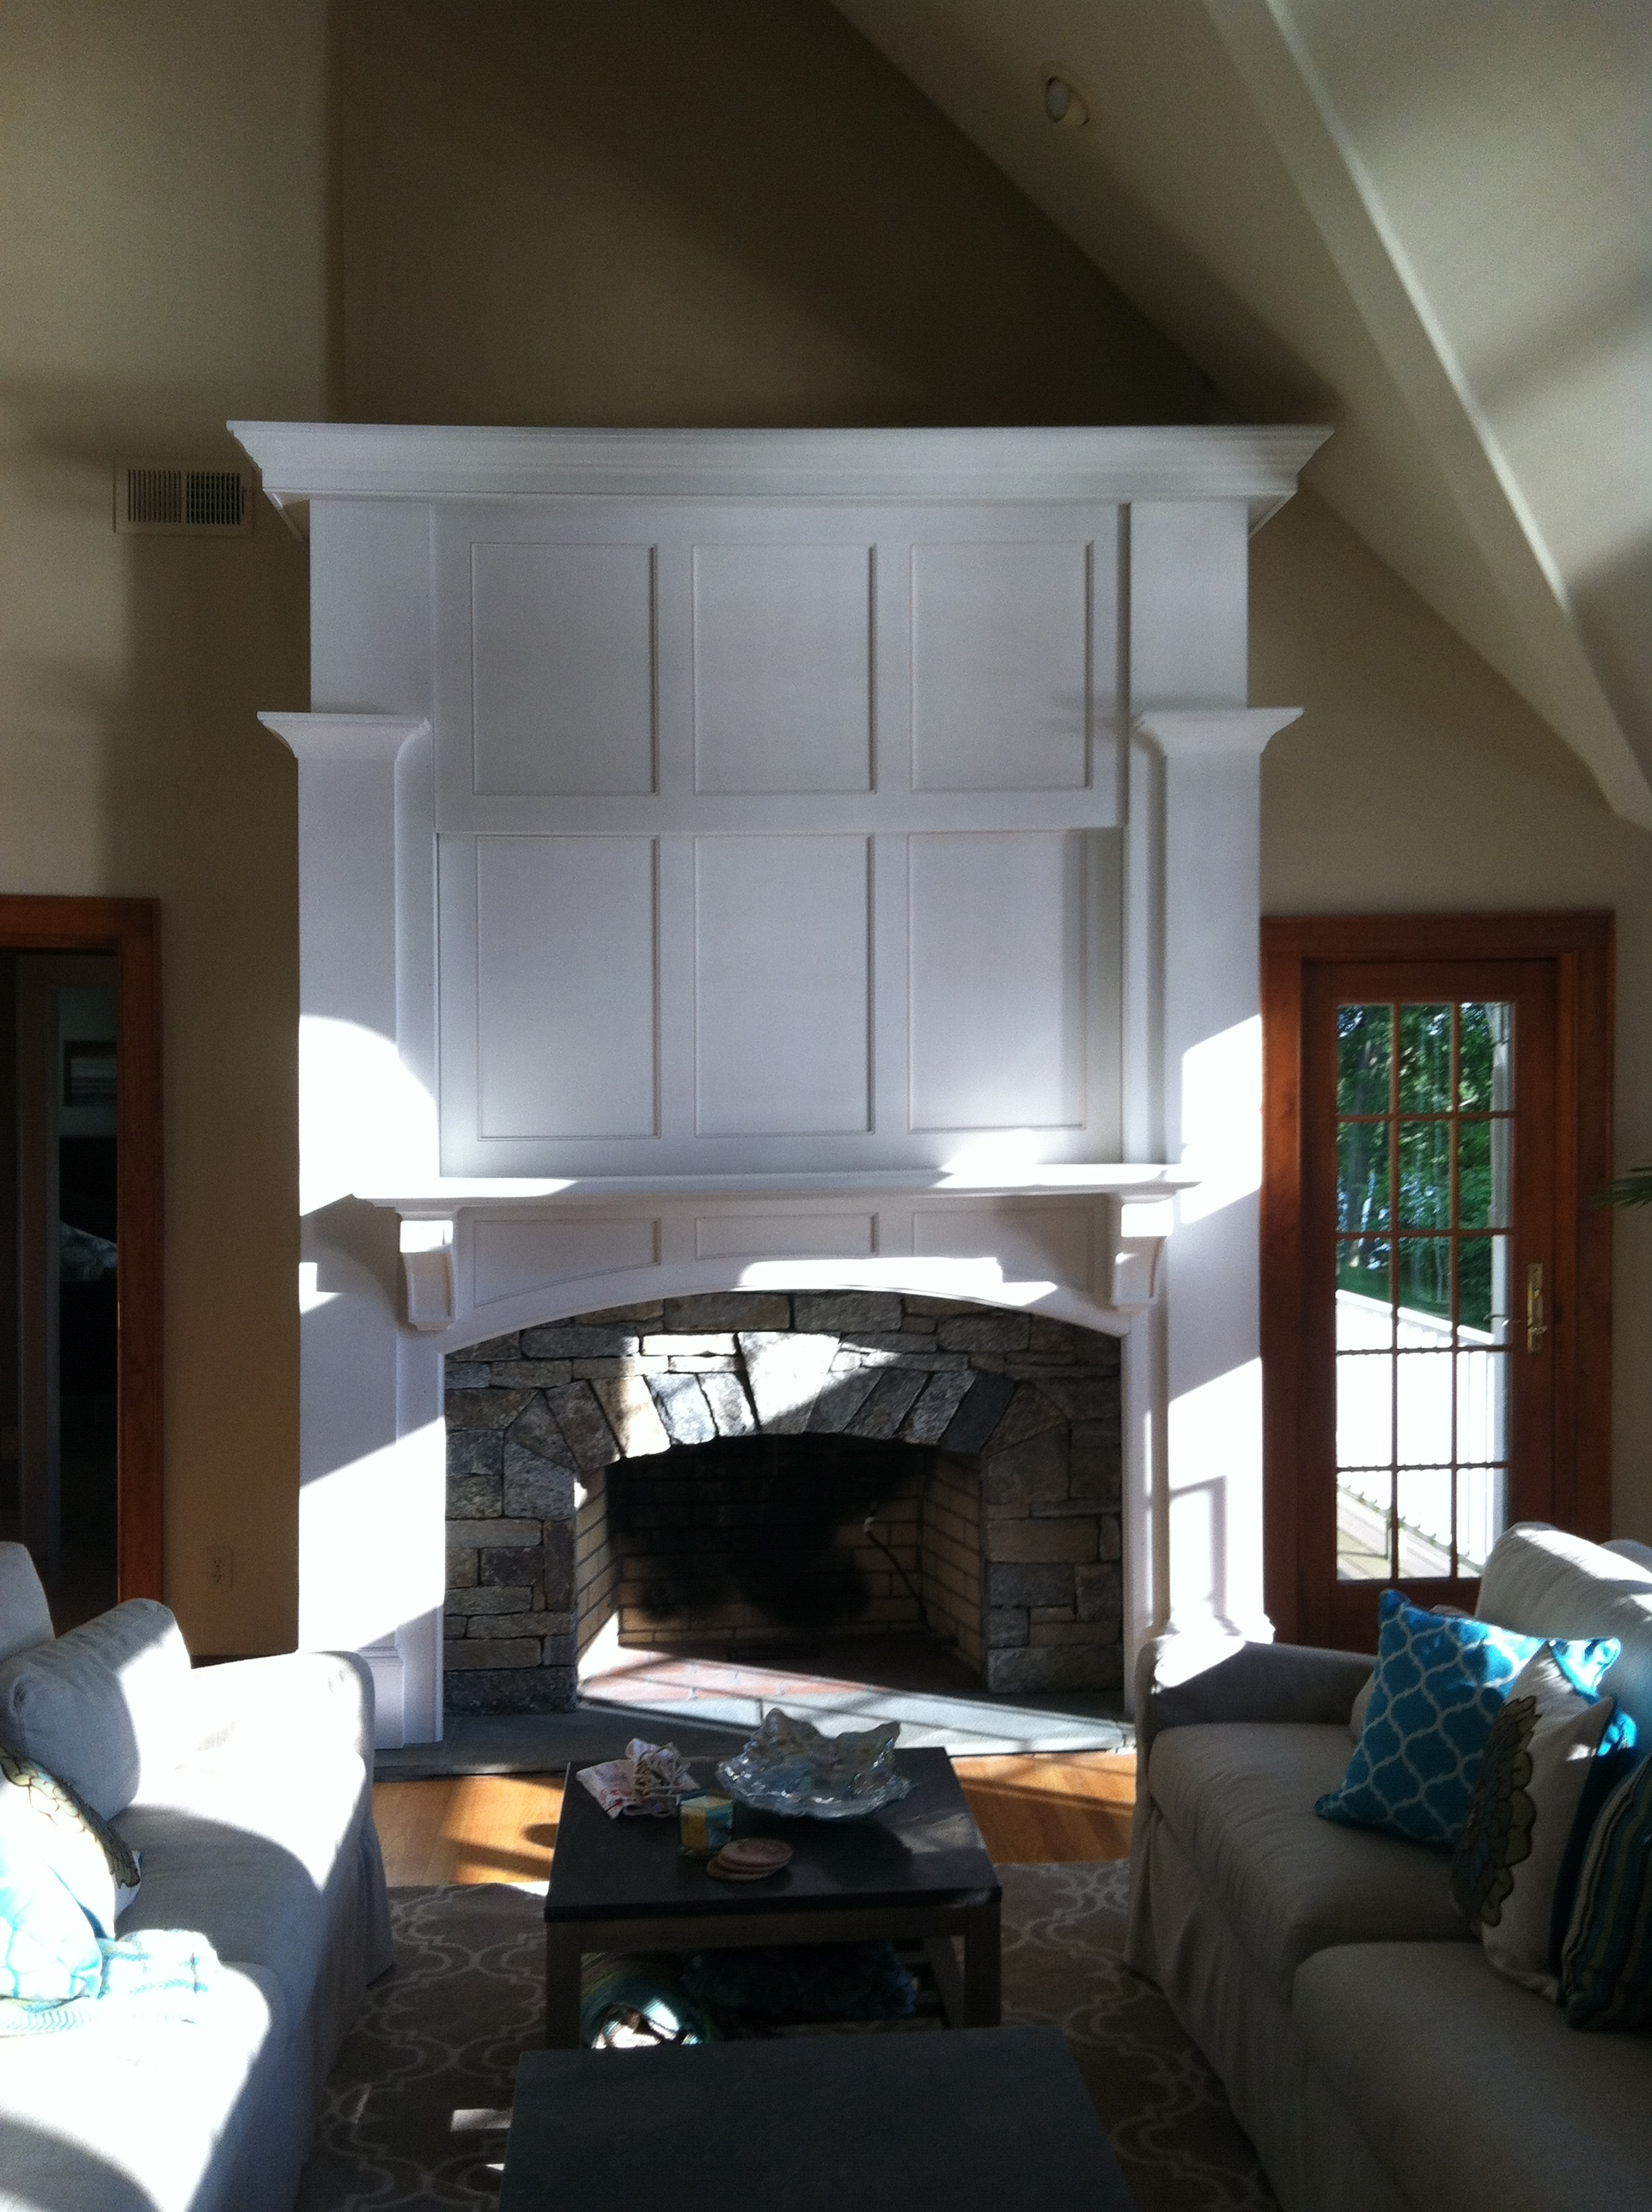 Fireplace Surround with Motorized Panel Lift 9.jpg